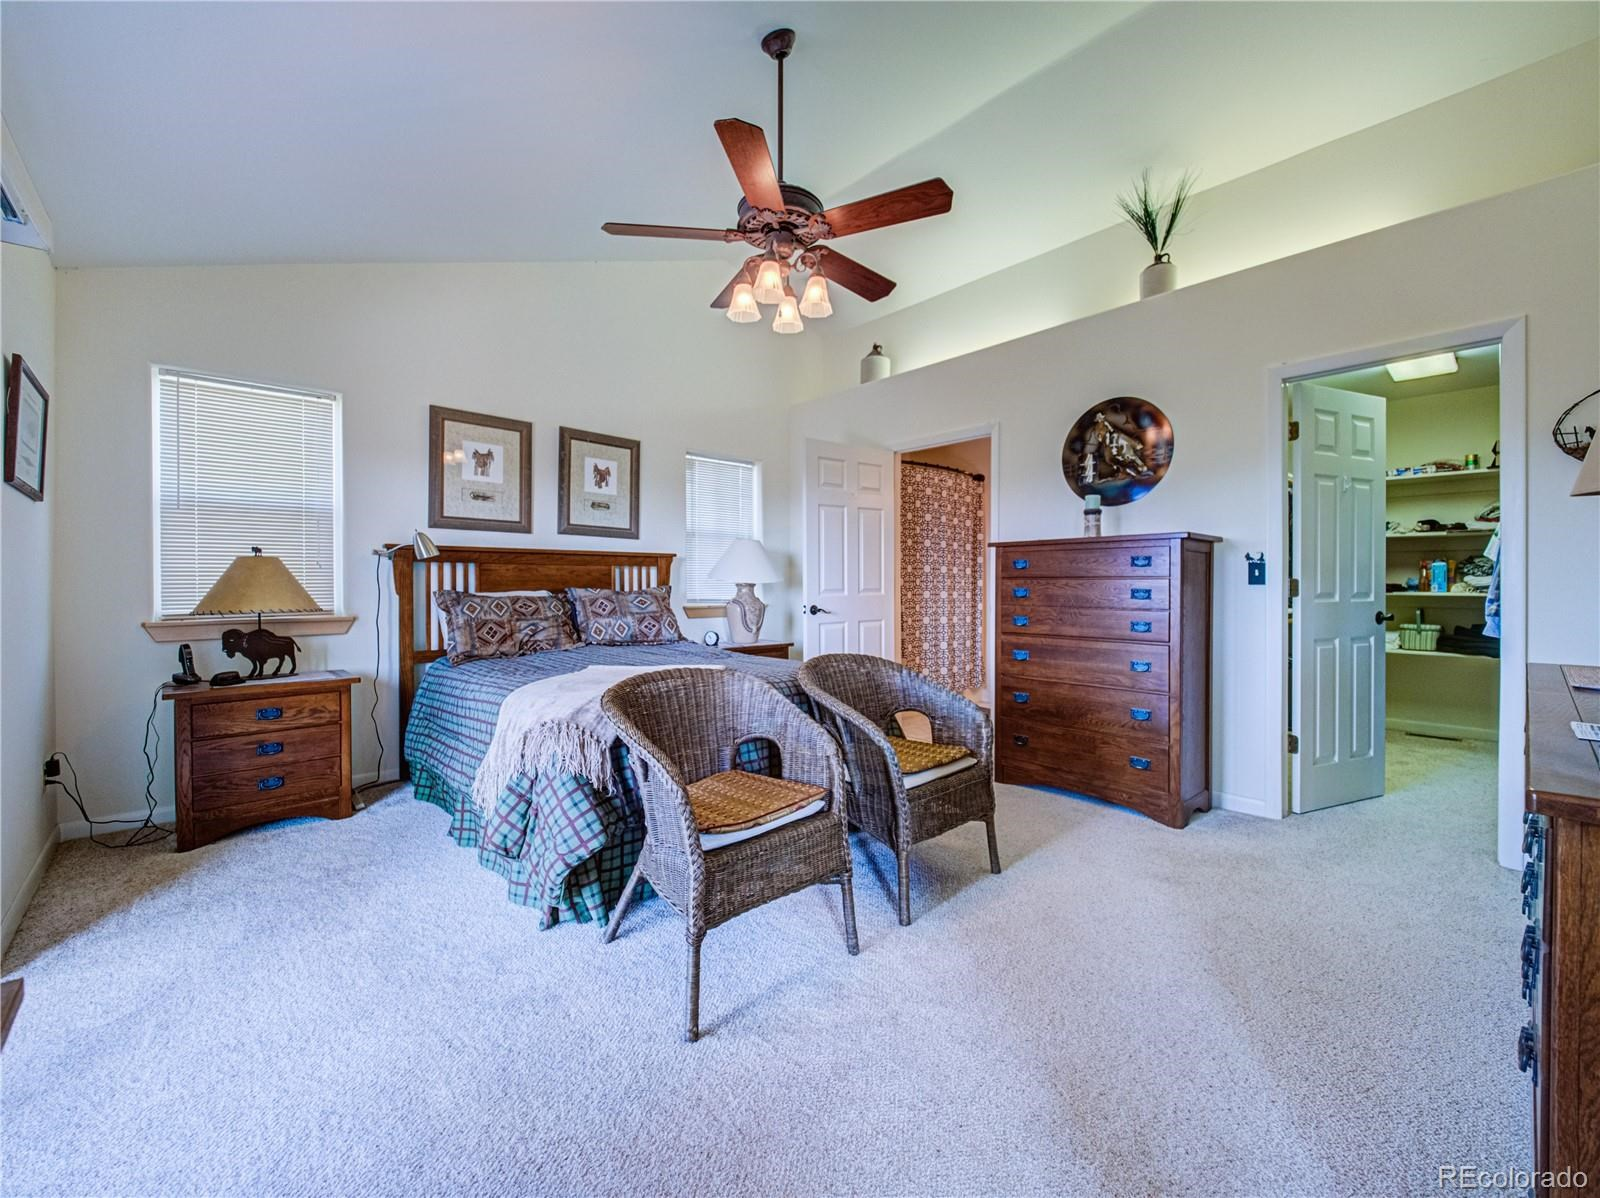 MLS# 3332968 - 21 - 296 Cedar Bluff Drive, Cotopaxi, CO 81223